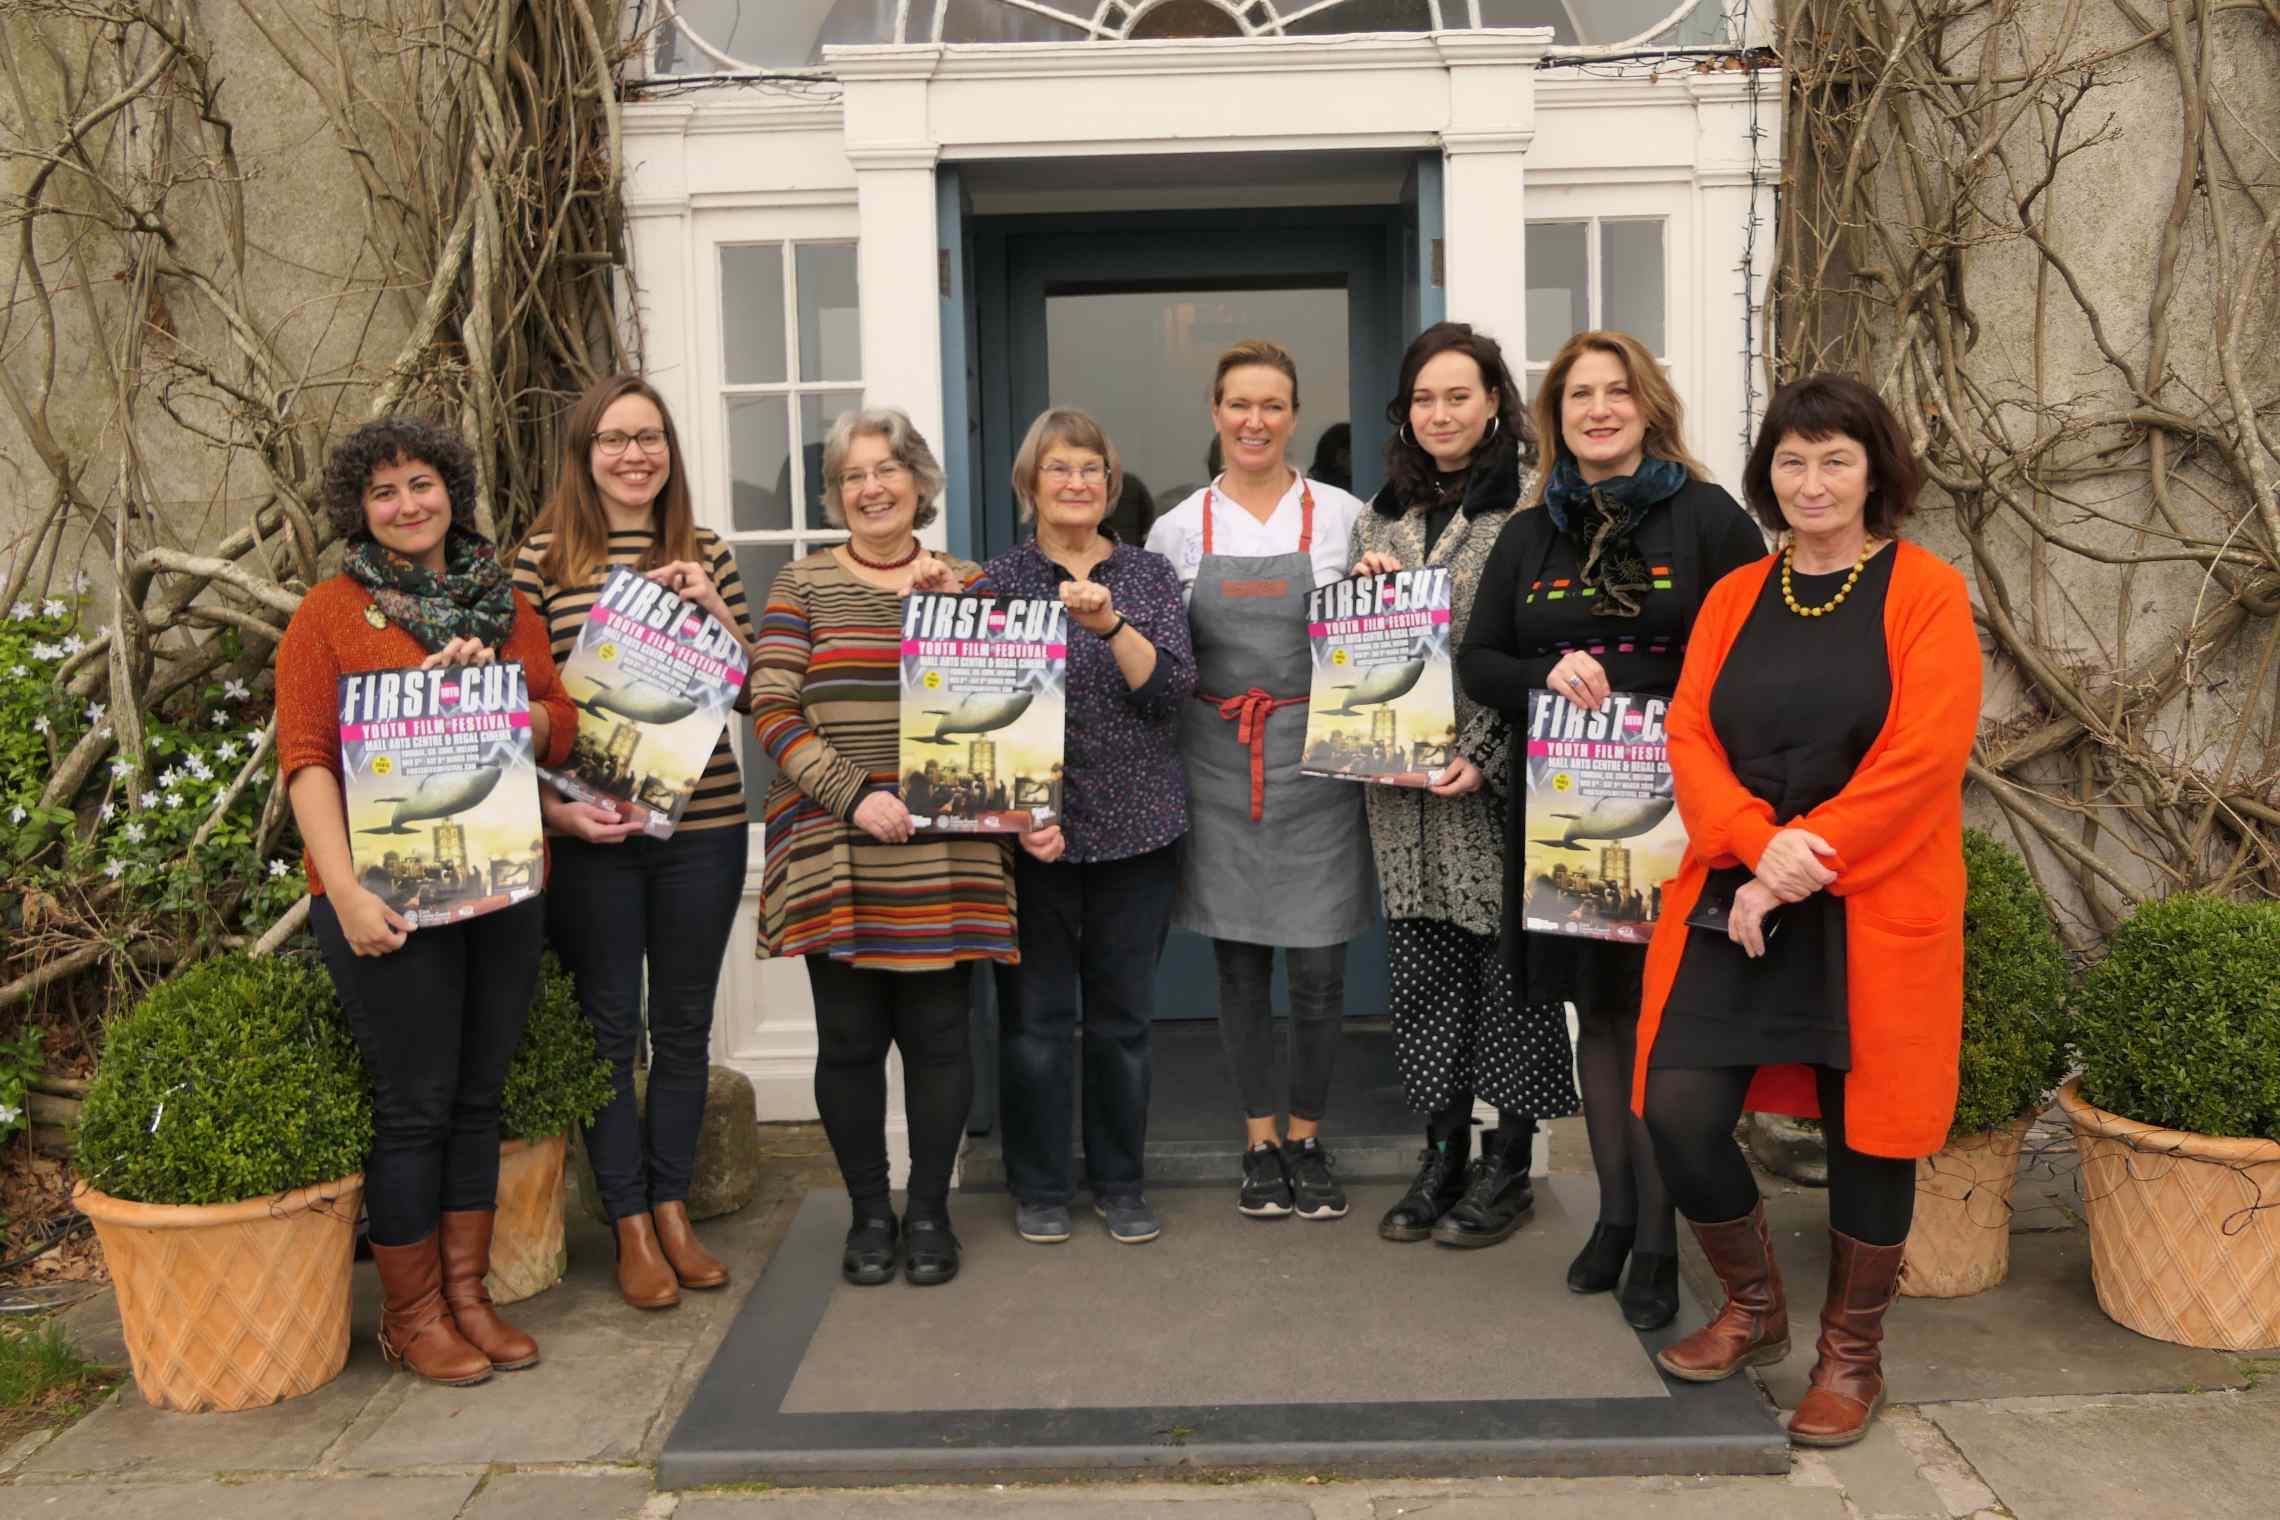 First Cut! Youth Film Festival - Festival Sponsors